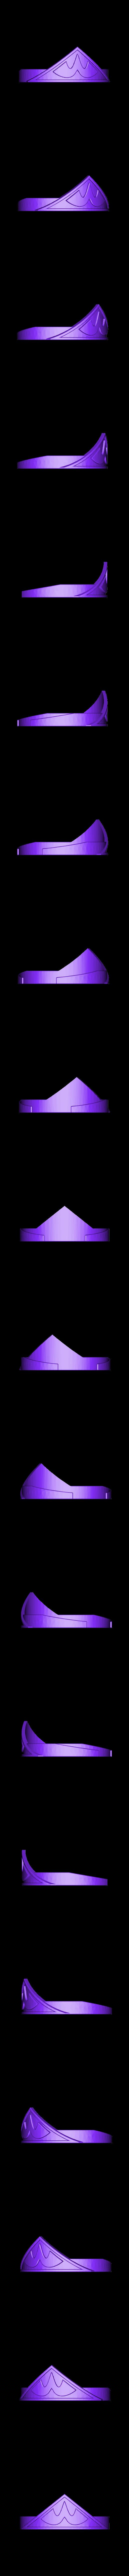 wonderellastiaraV2.STL Download free STL file Wonderella's Tiara • 3D print model, aevafortinhi